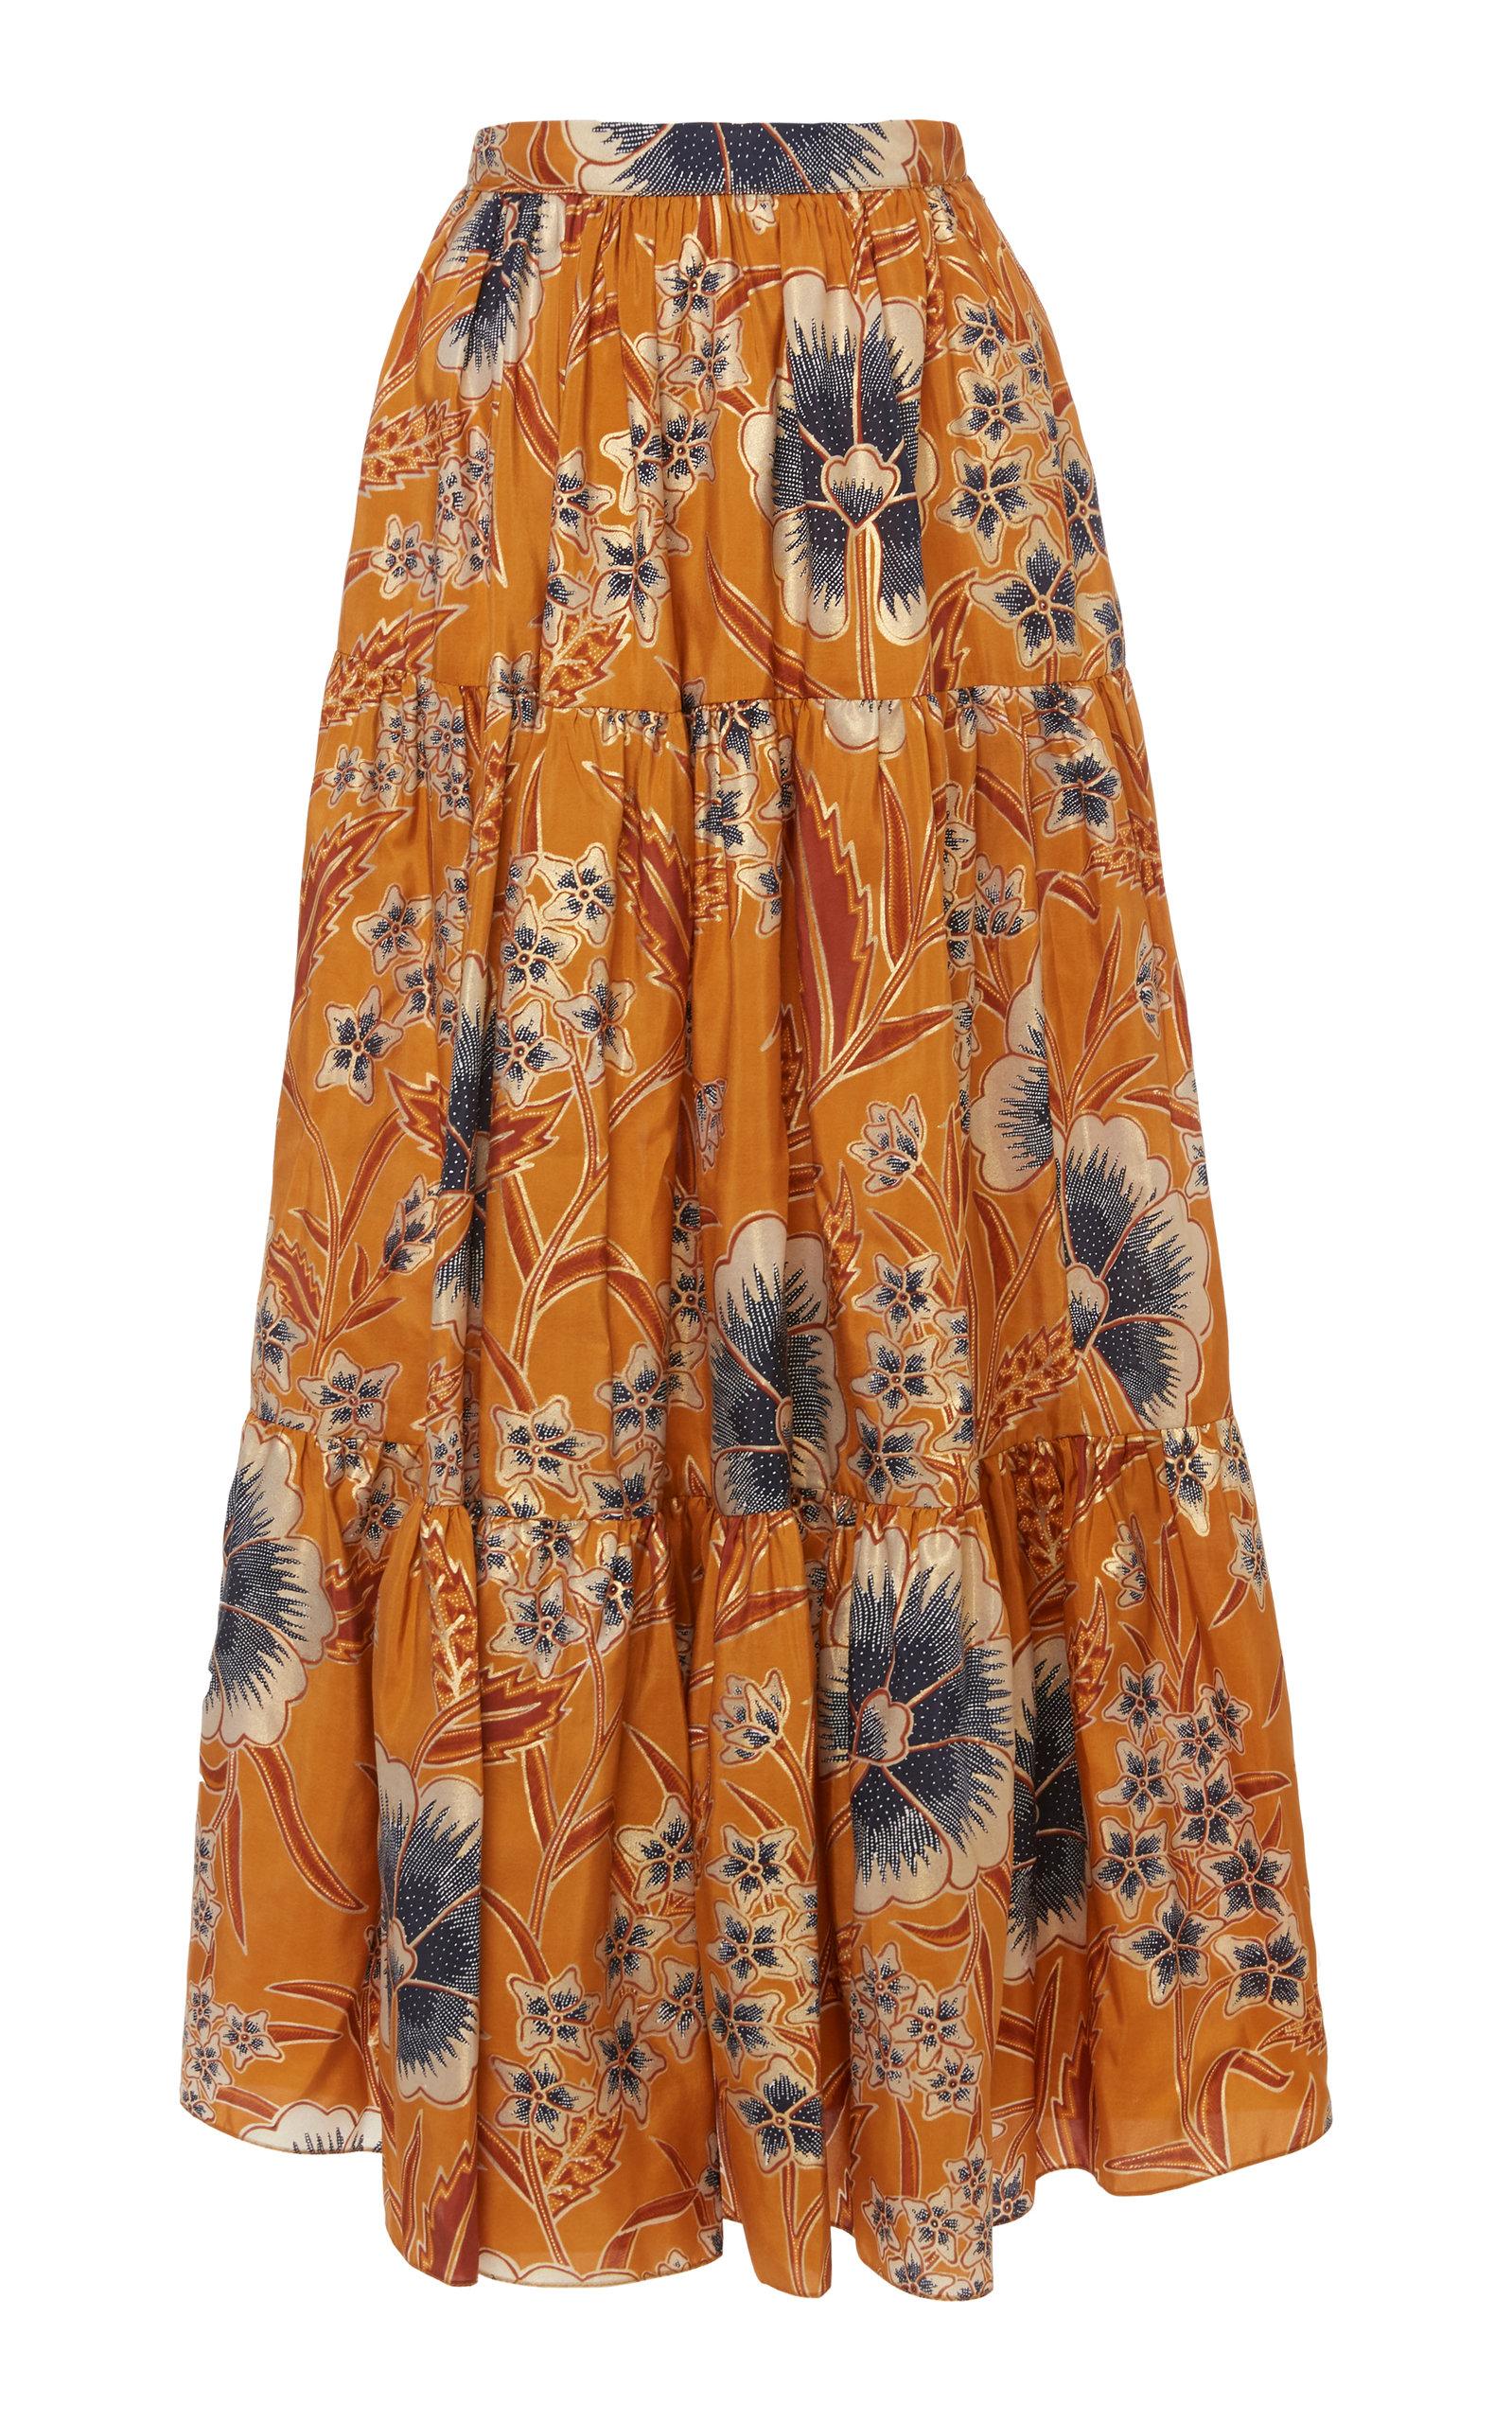 large_ulla-johnson-orange-chantal-floral-print-silk-maxi-skirt.jpg